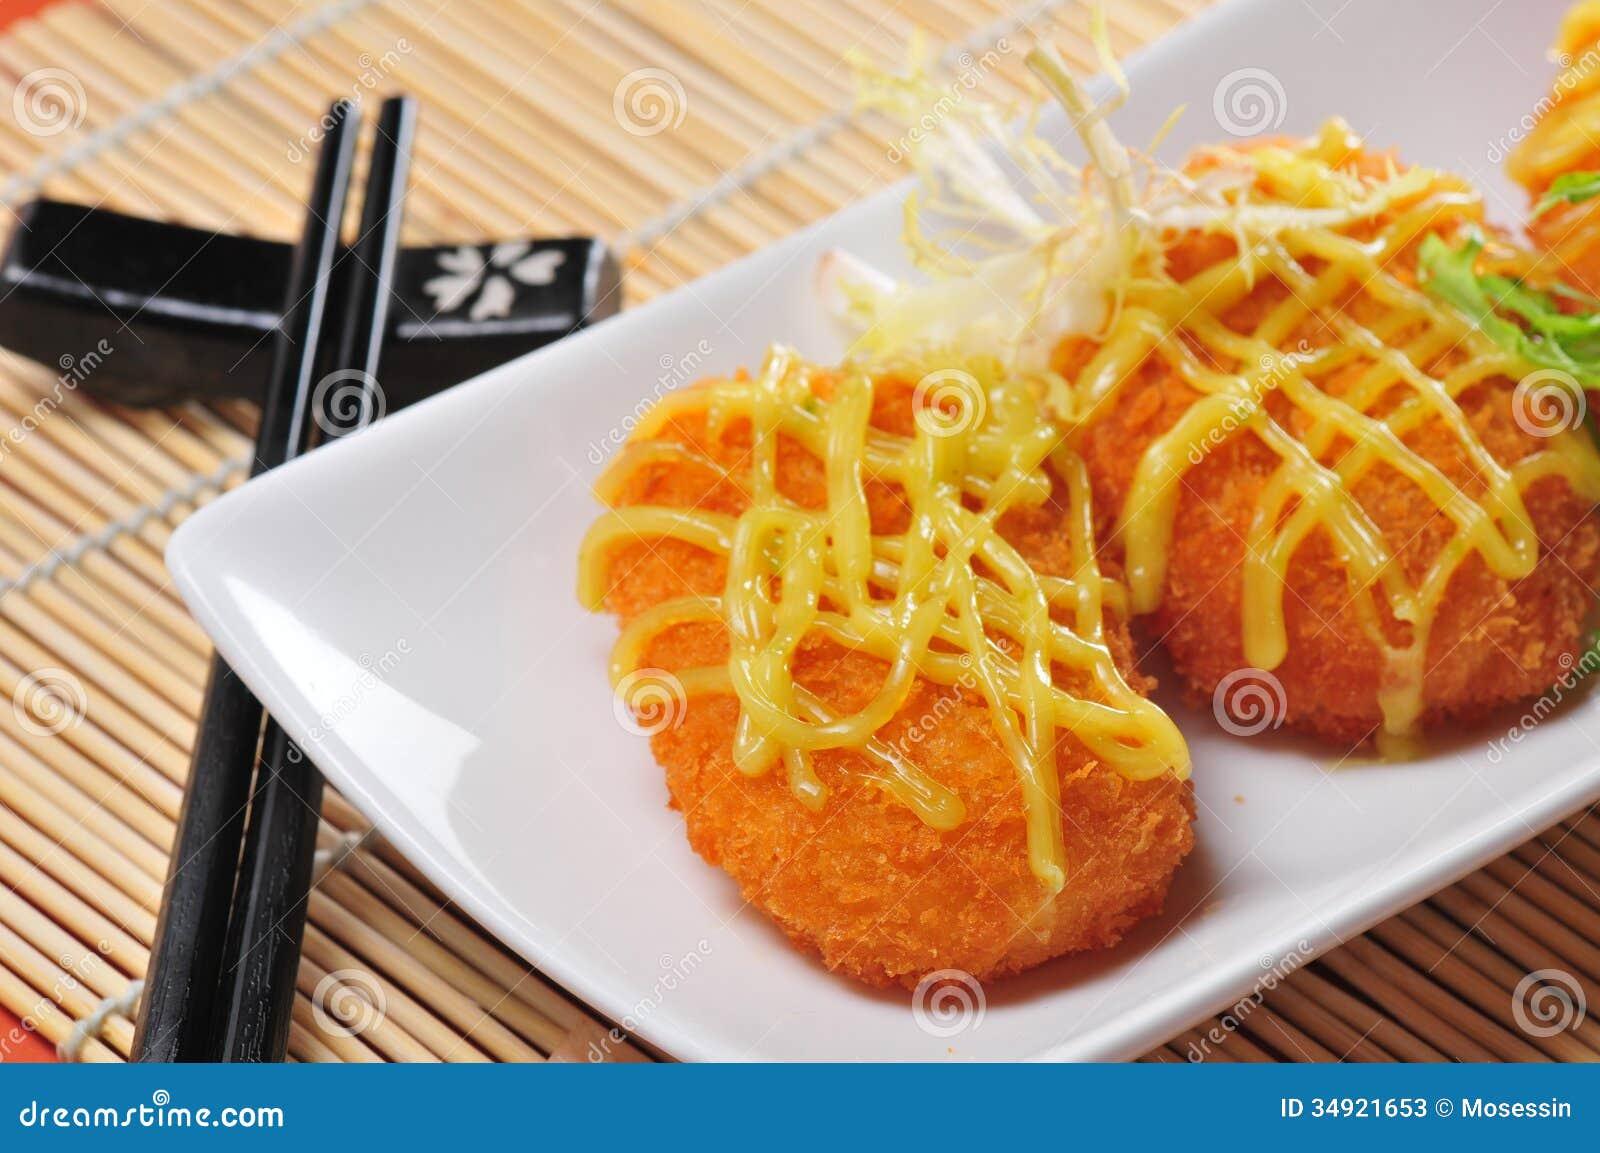 Fried Shrimp Cake Stock Photos - Image: 34921653